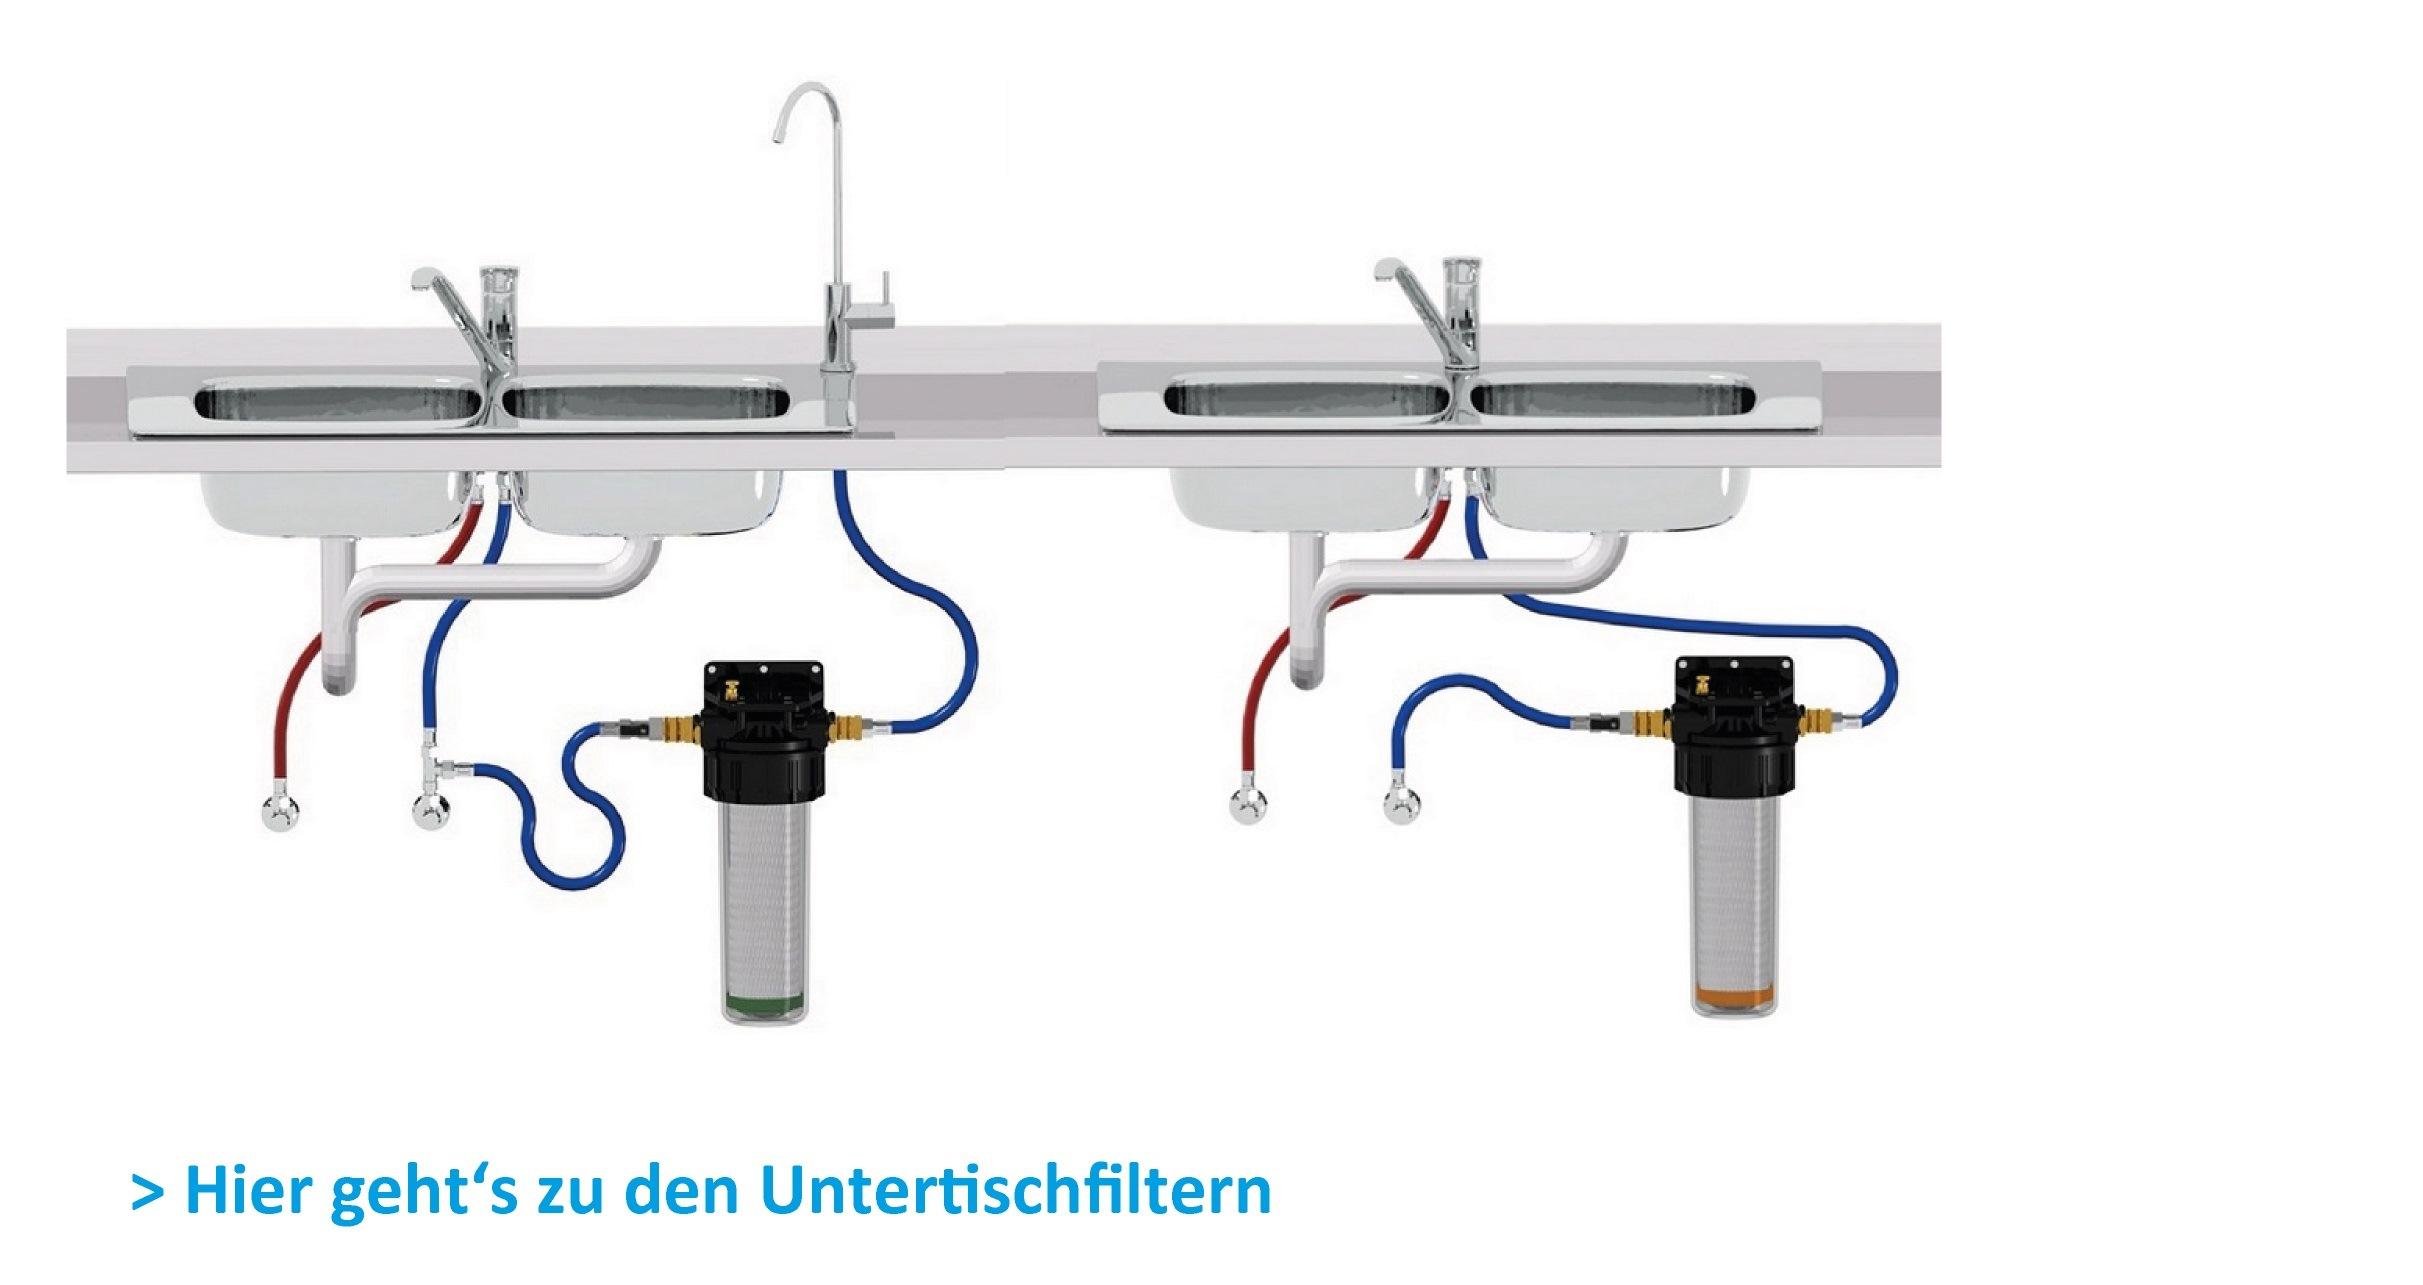 Untertisch_TrinkwasserfilterEv4v4kHNyOvRG